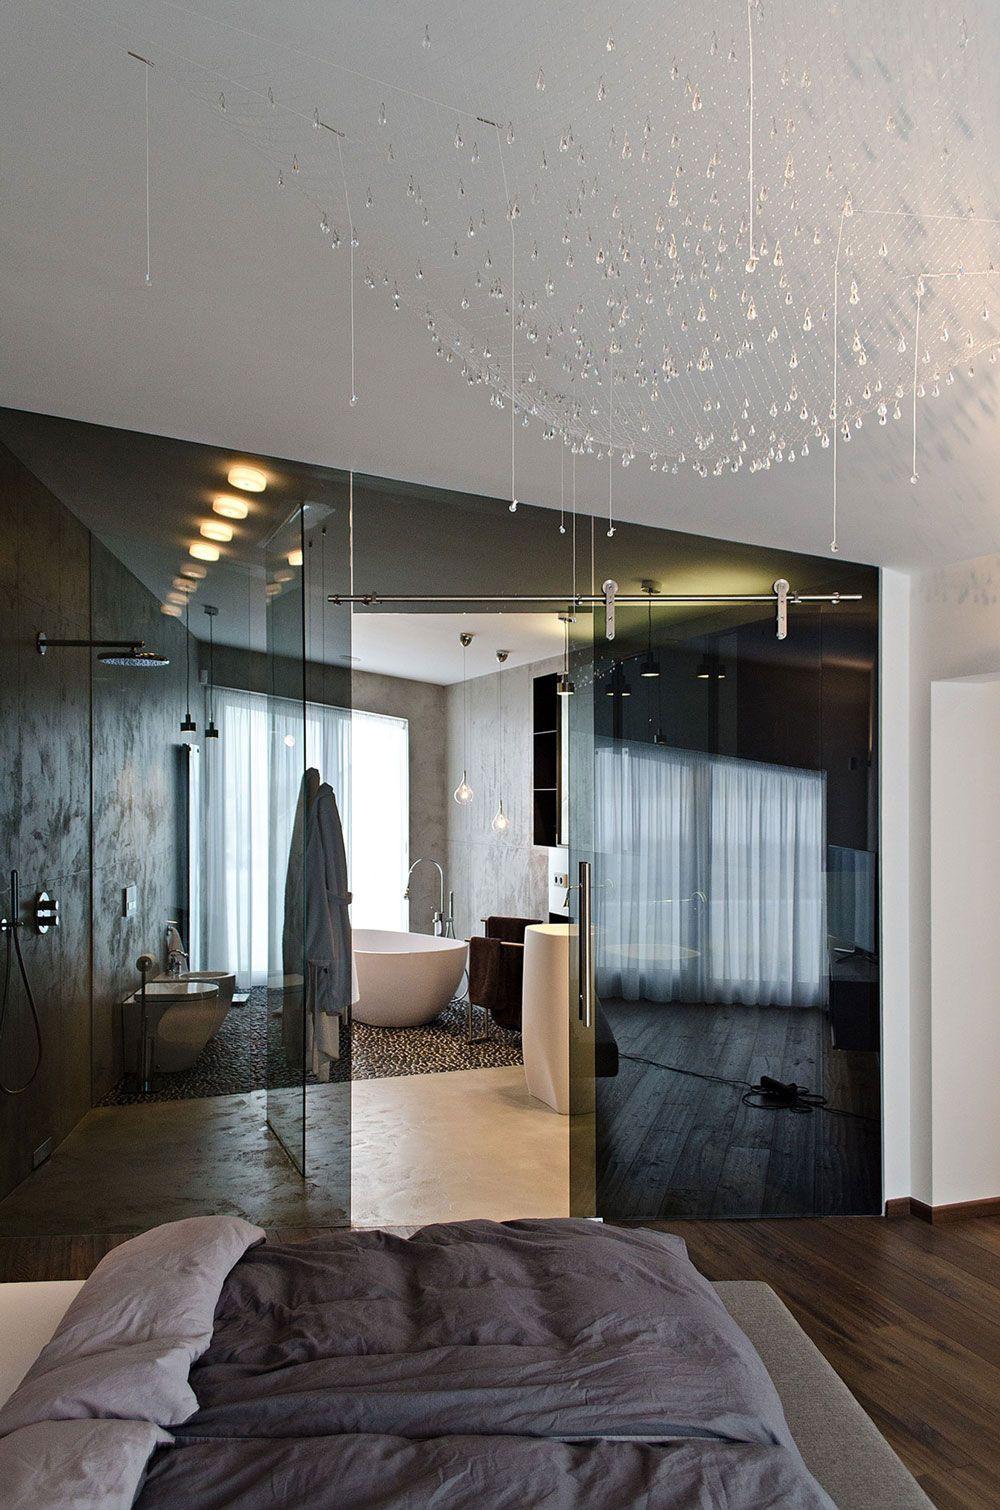 25 Stunning Modern Glass Bathroom Designs